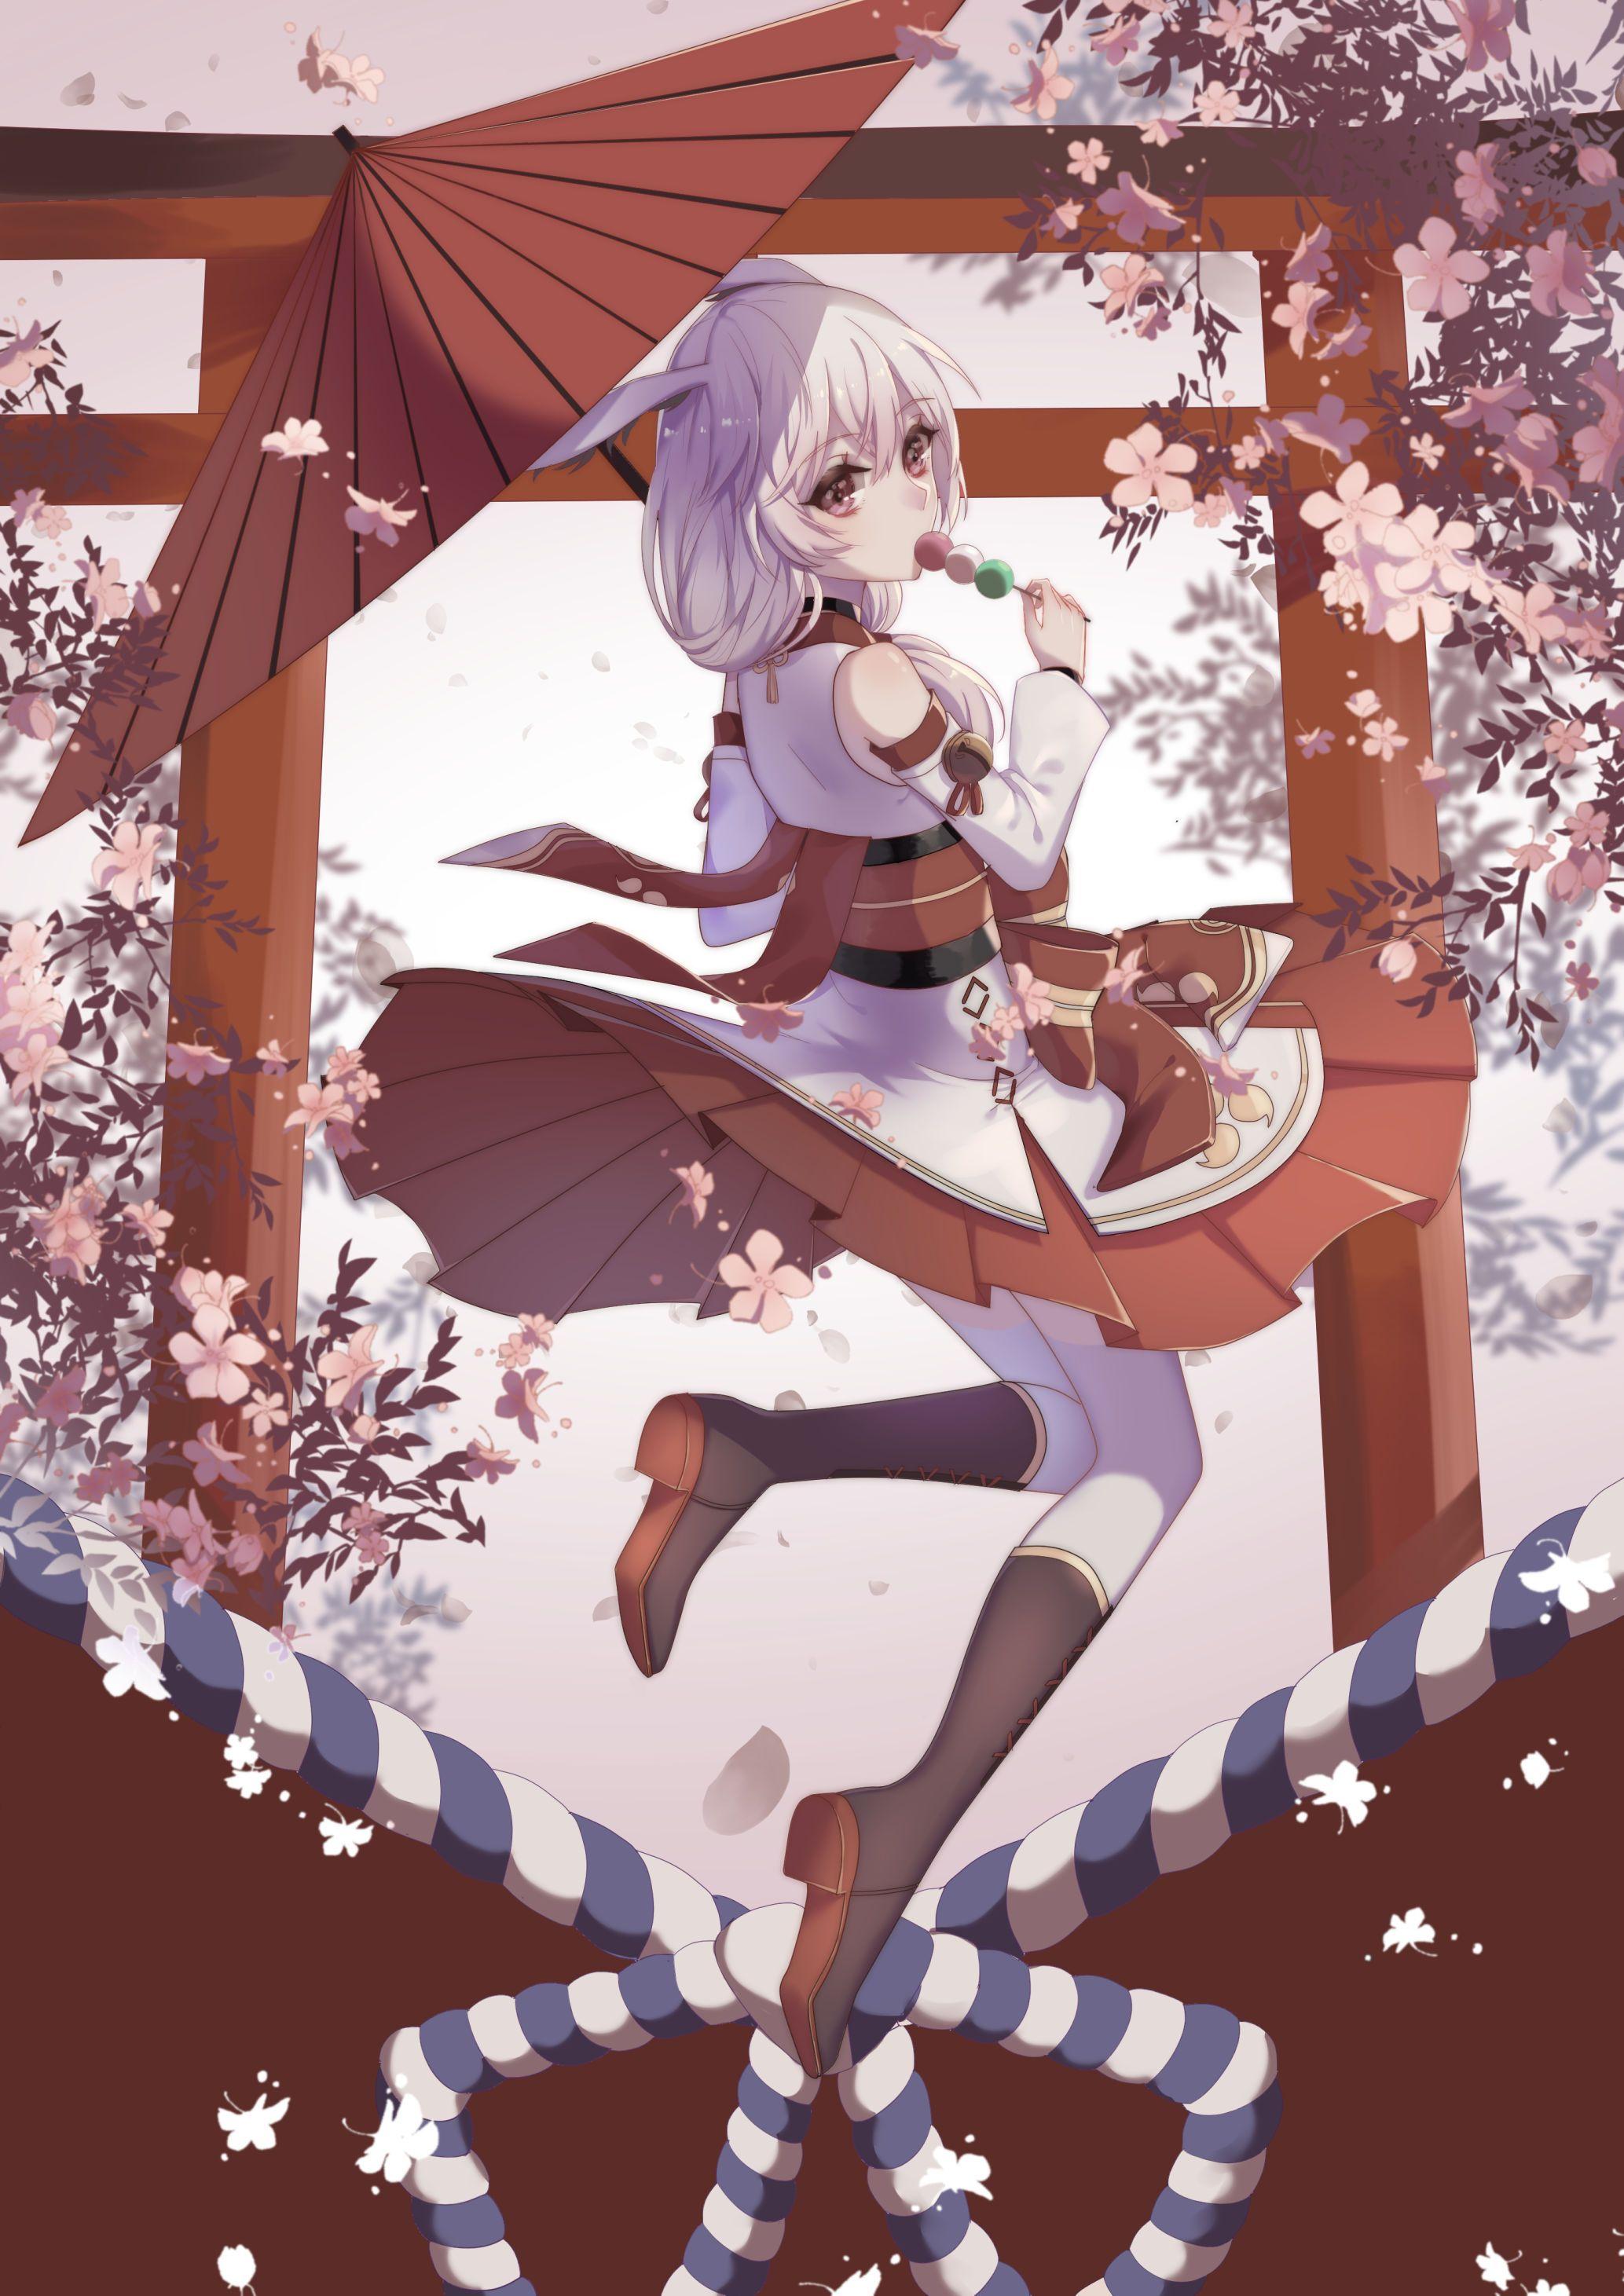 Theresa Apocalypse Honkai Impact 3rd Follow Me For More Great Images Anime Anime Characters Anime Art